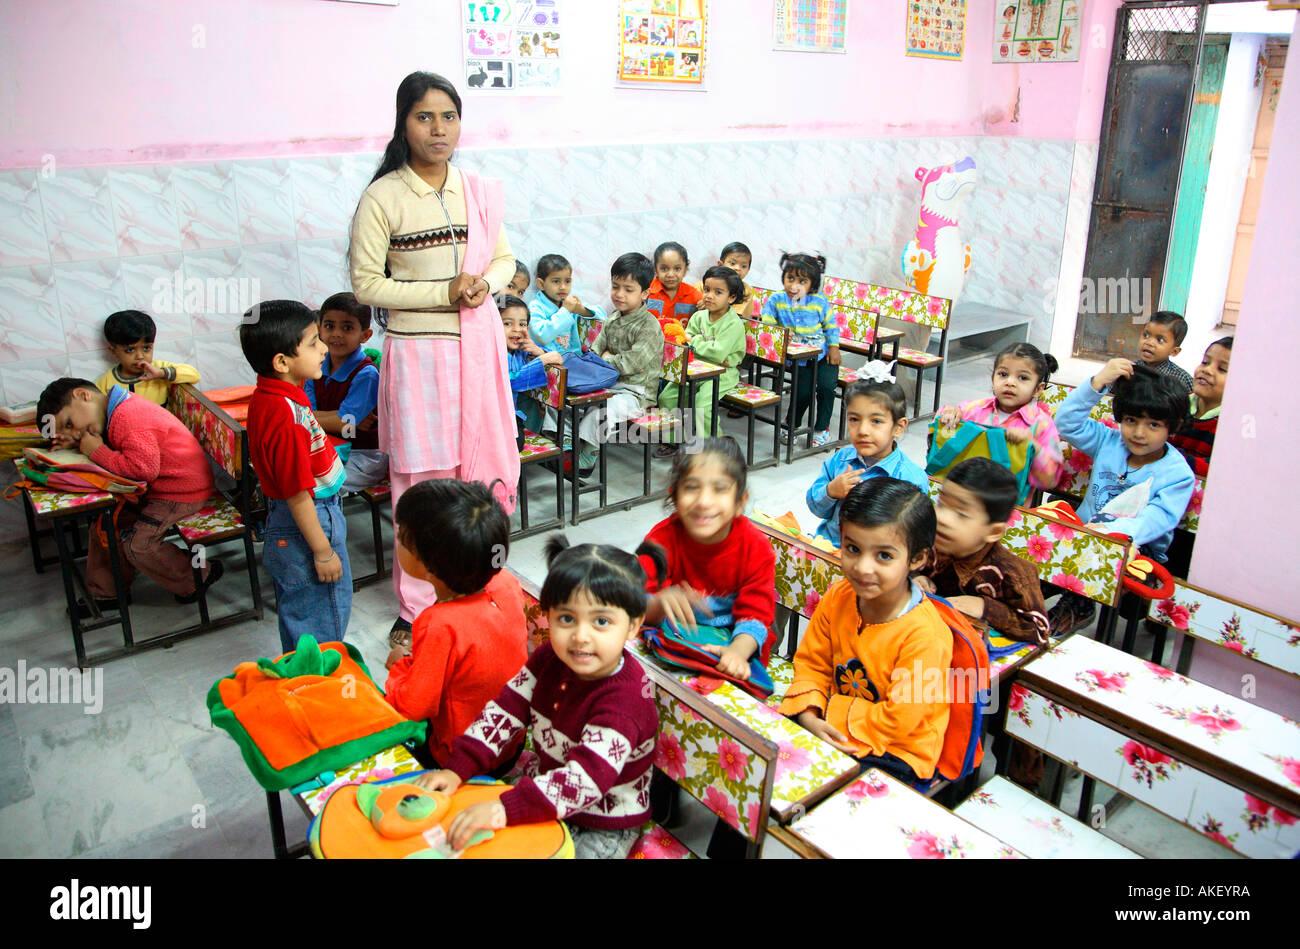 India Play School Nursery School Stock Photo